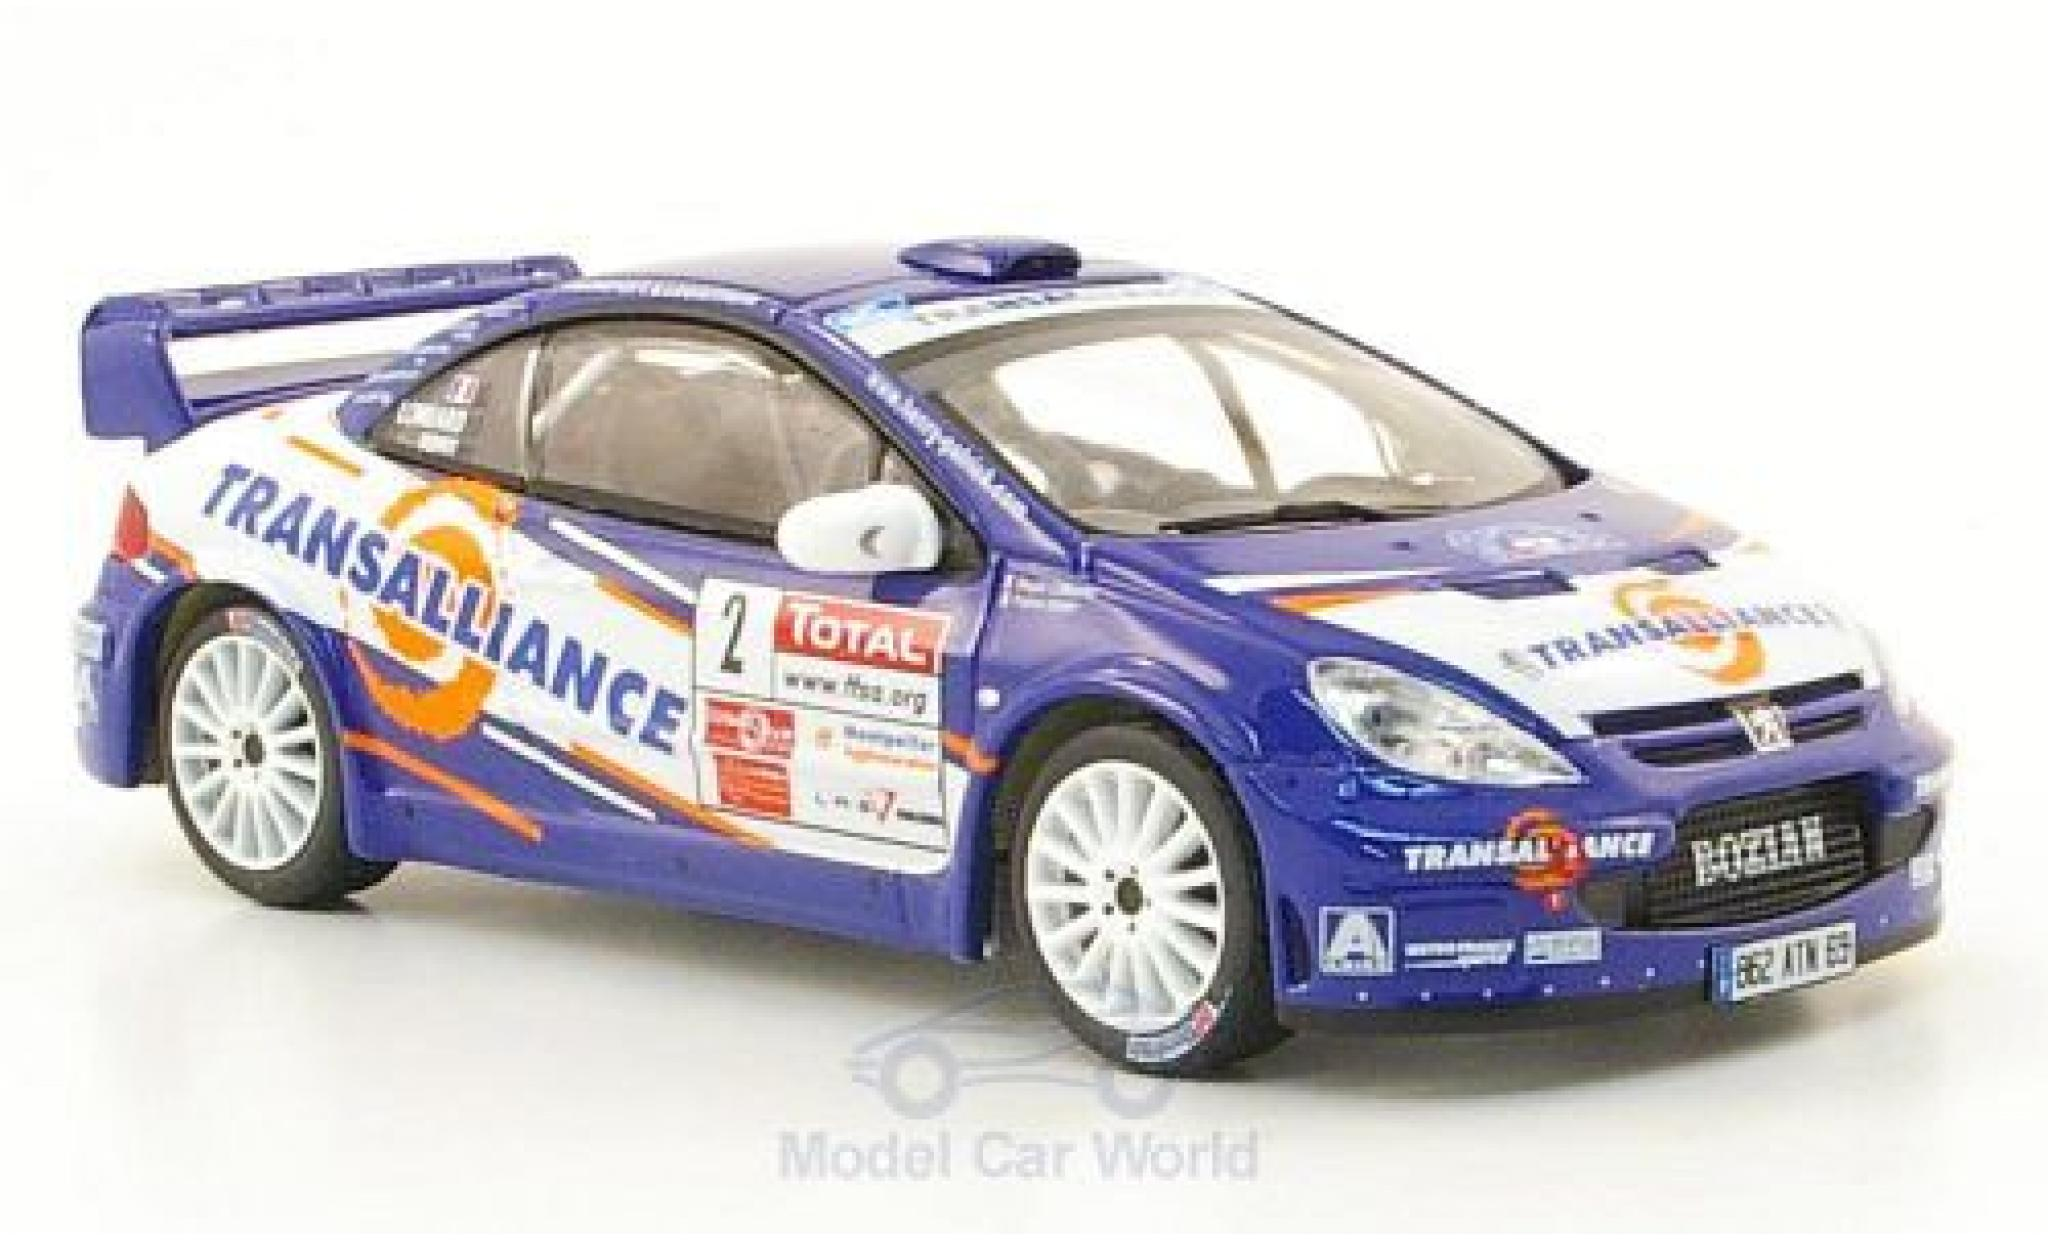 Peugeot 307 WRC 1/43 IXO WRC No.2 Transalliance Rally Cevennes 2007 P.Henry/M.Lombard